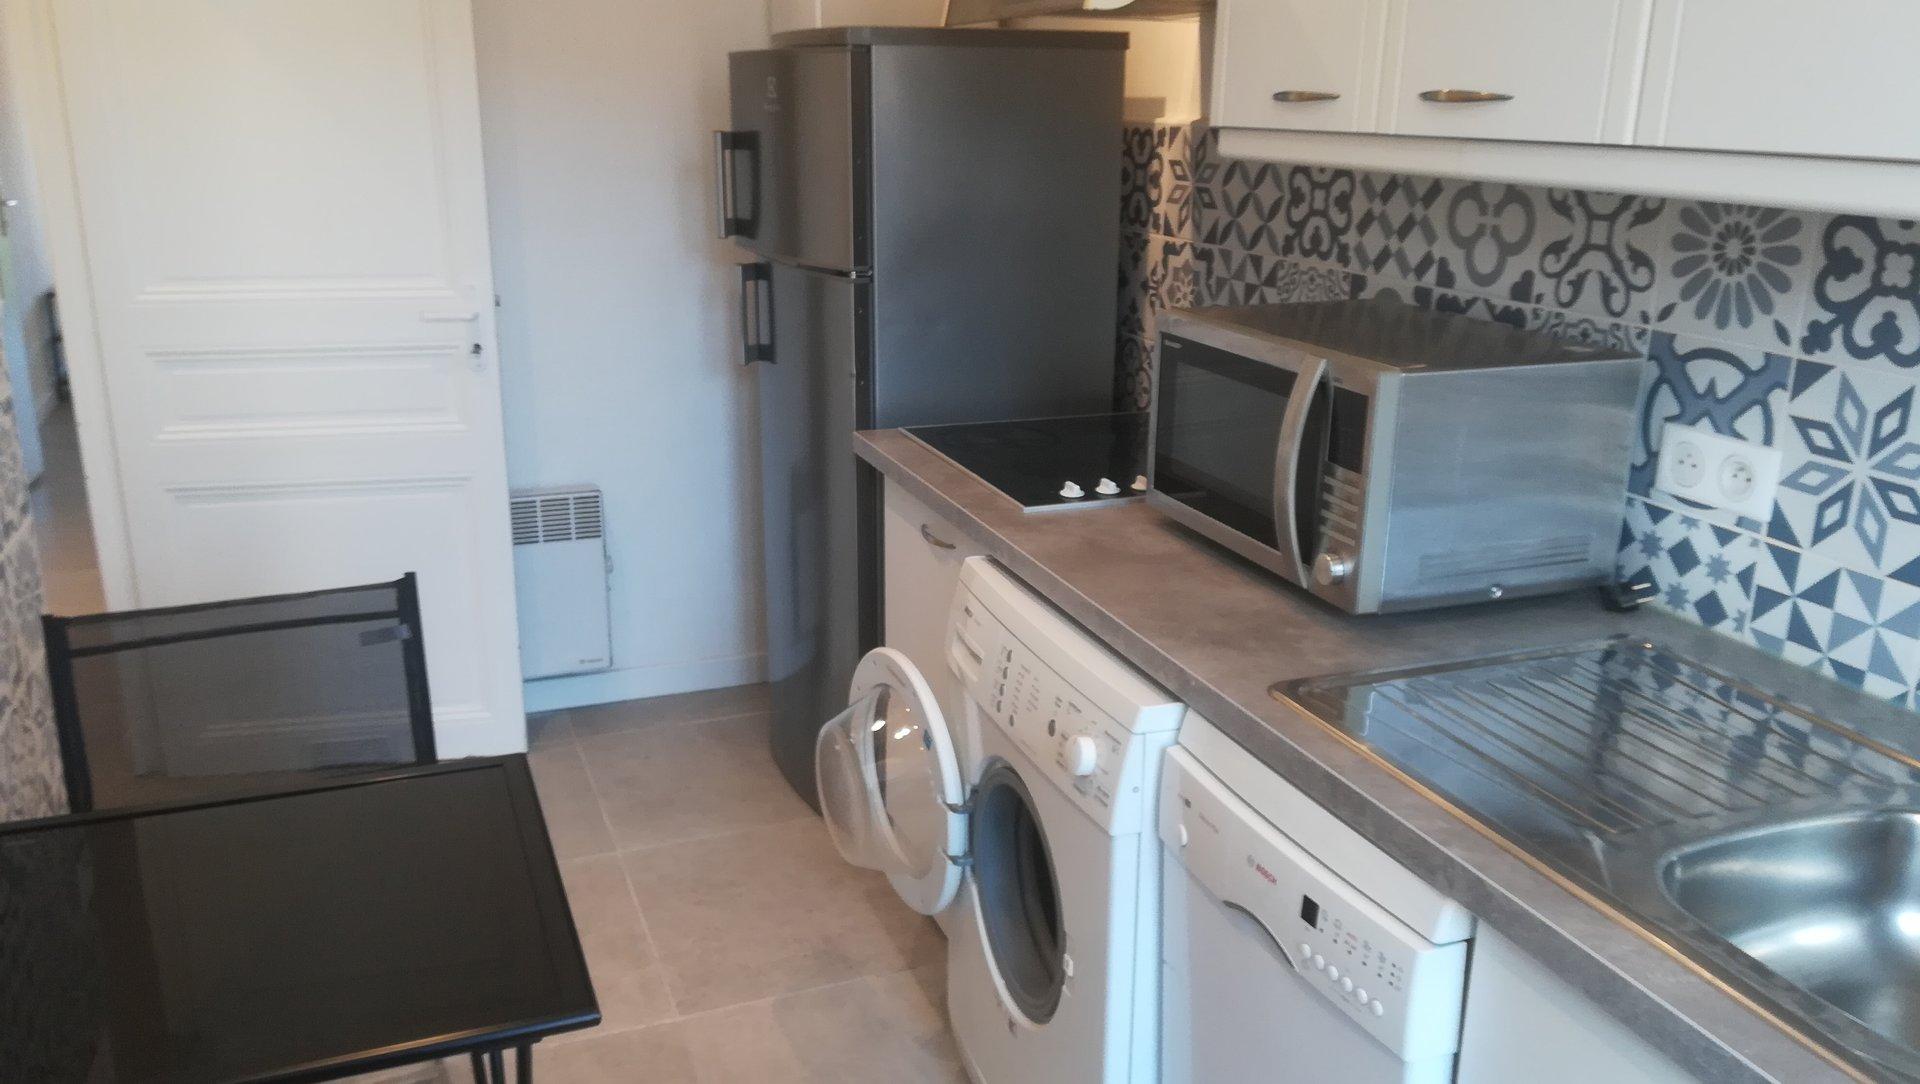 1 bedroom apartment - furnished